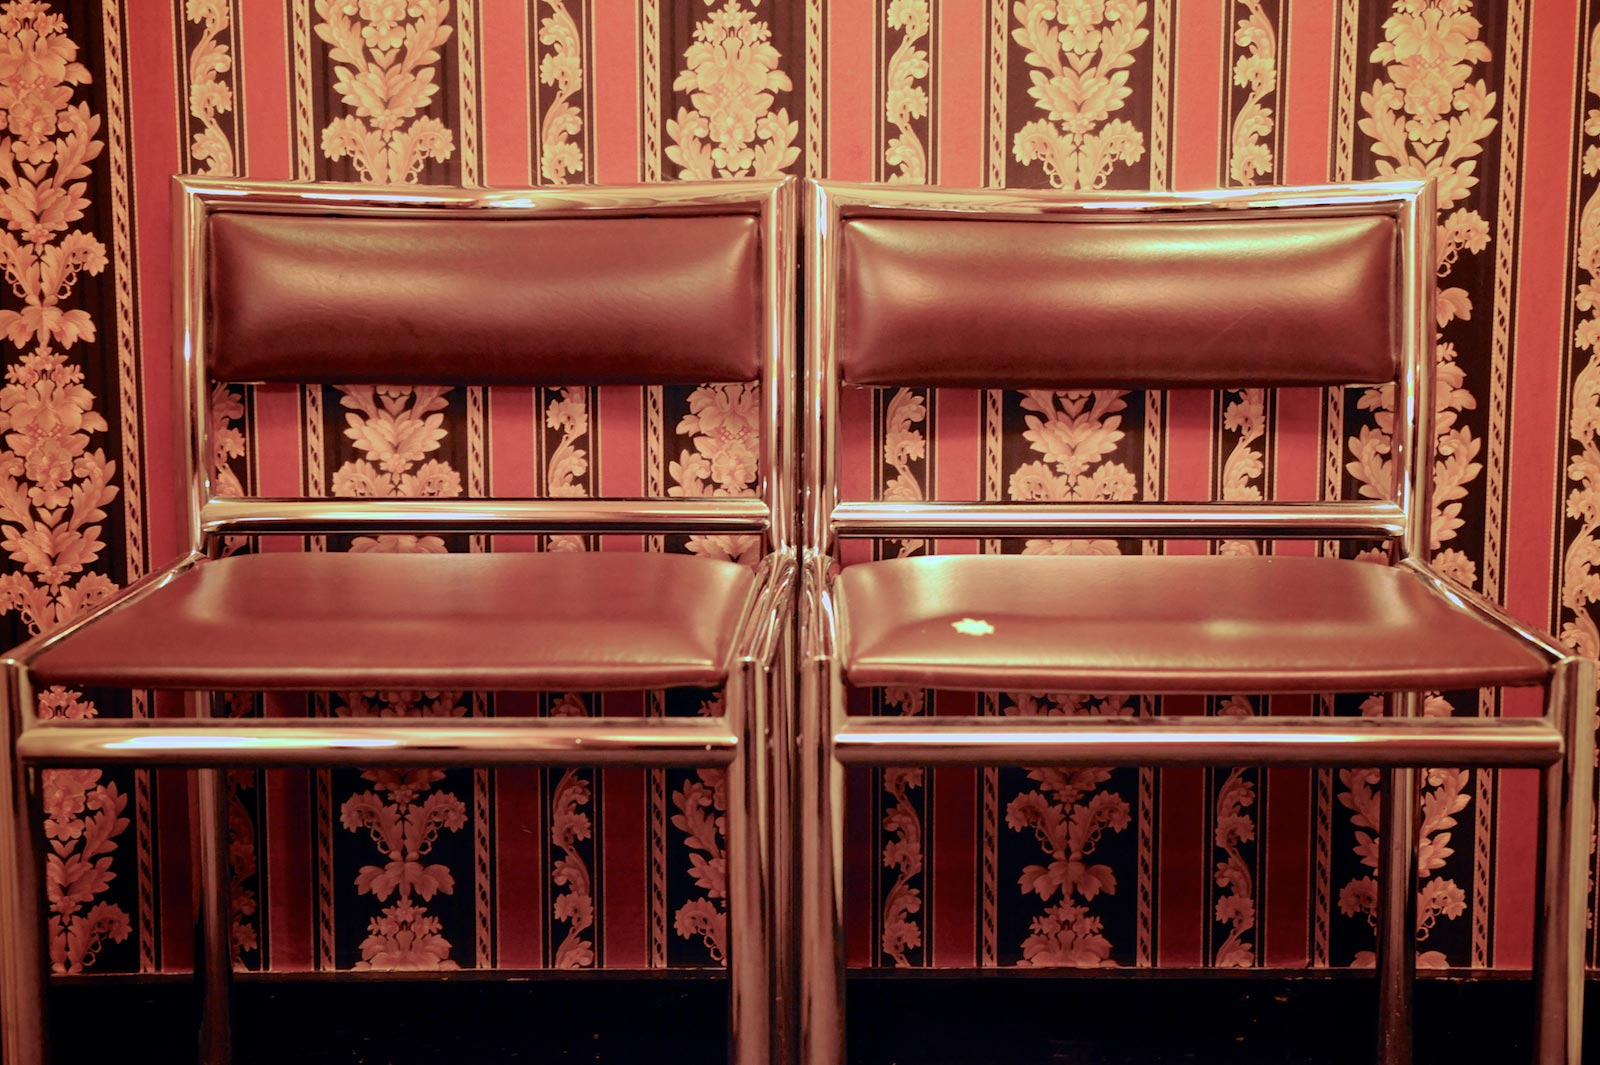 hotel-le-berger-rooms-superieur-antoinette-07-09.jpg